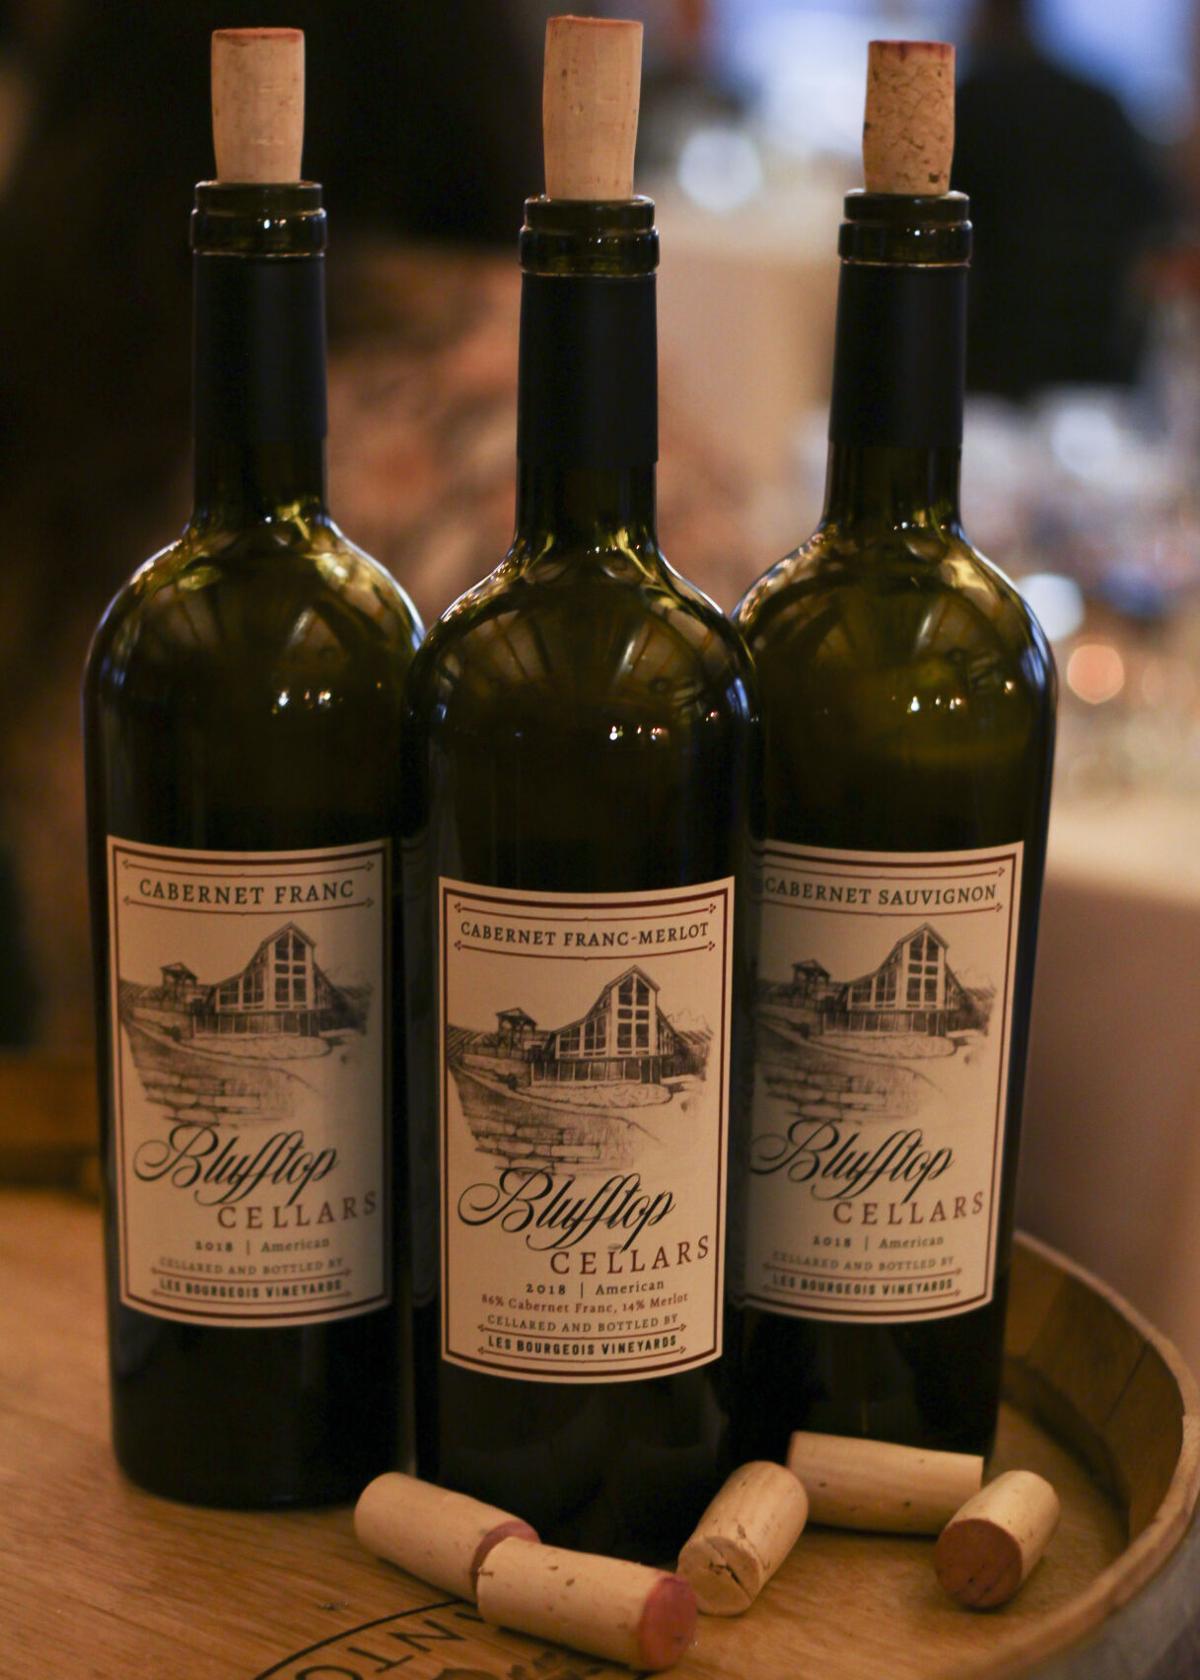 Blufftop Cellars wines